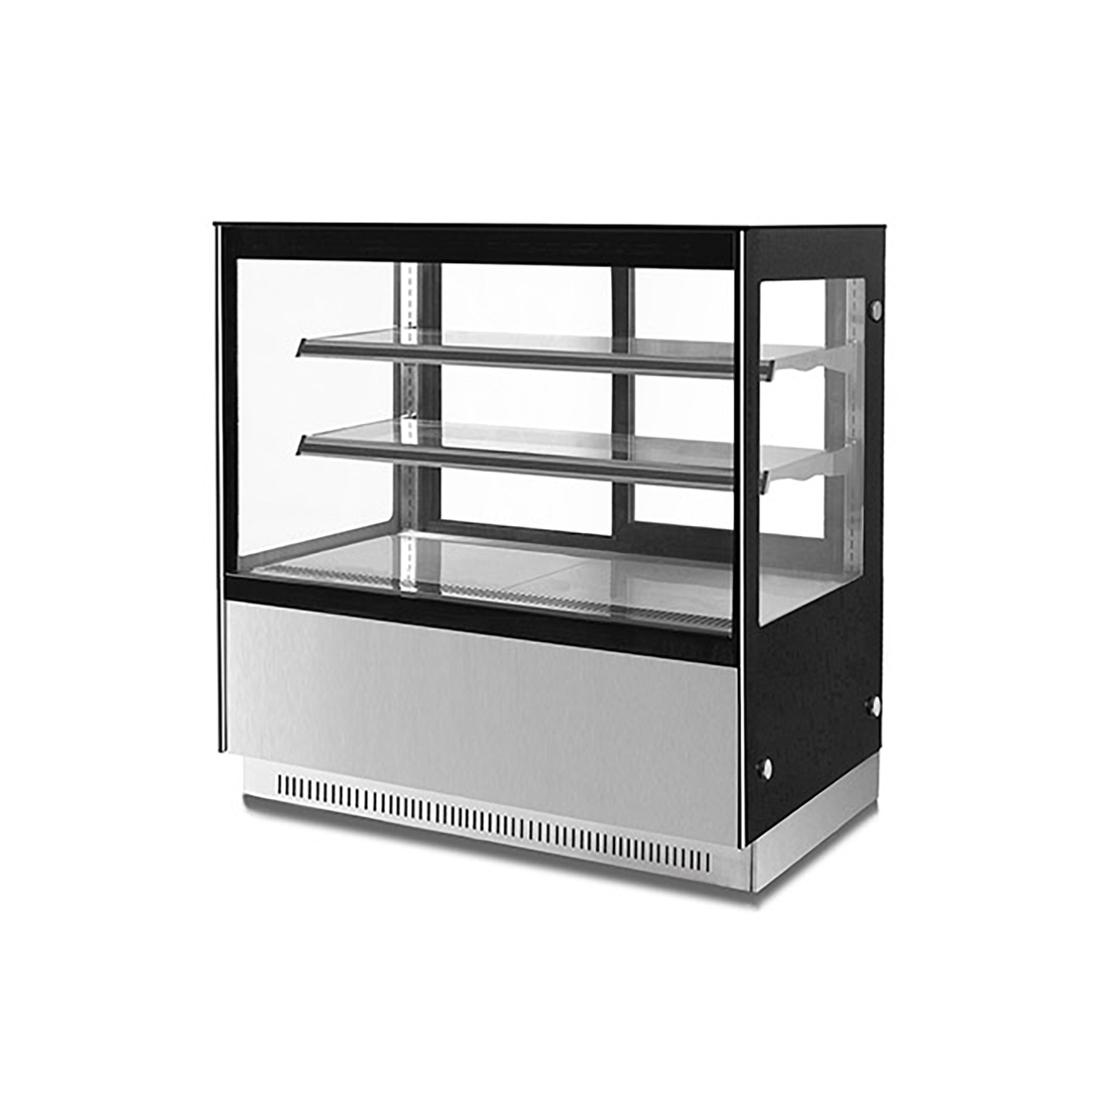 Modern 2 Shelves Cake or Food Display - GN-1200RF2